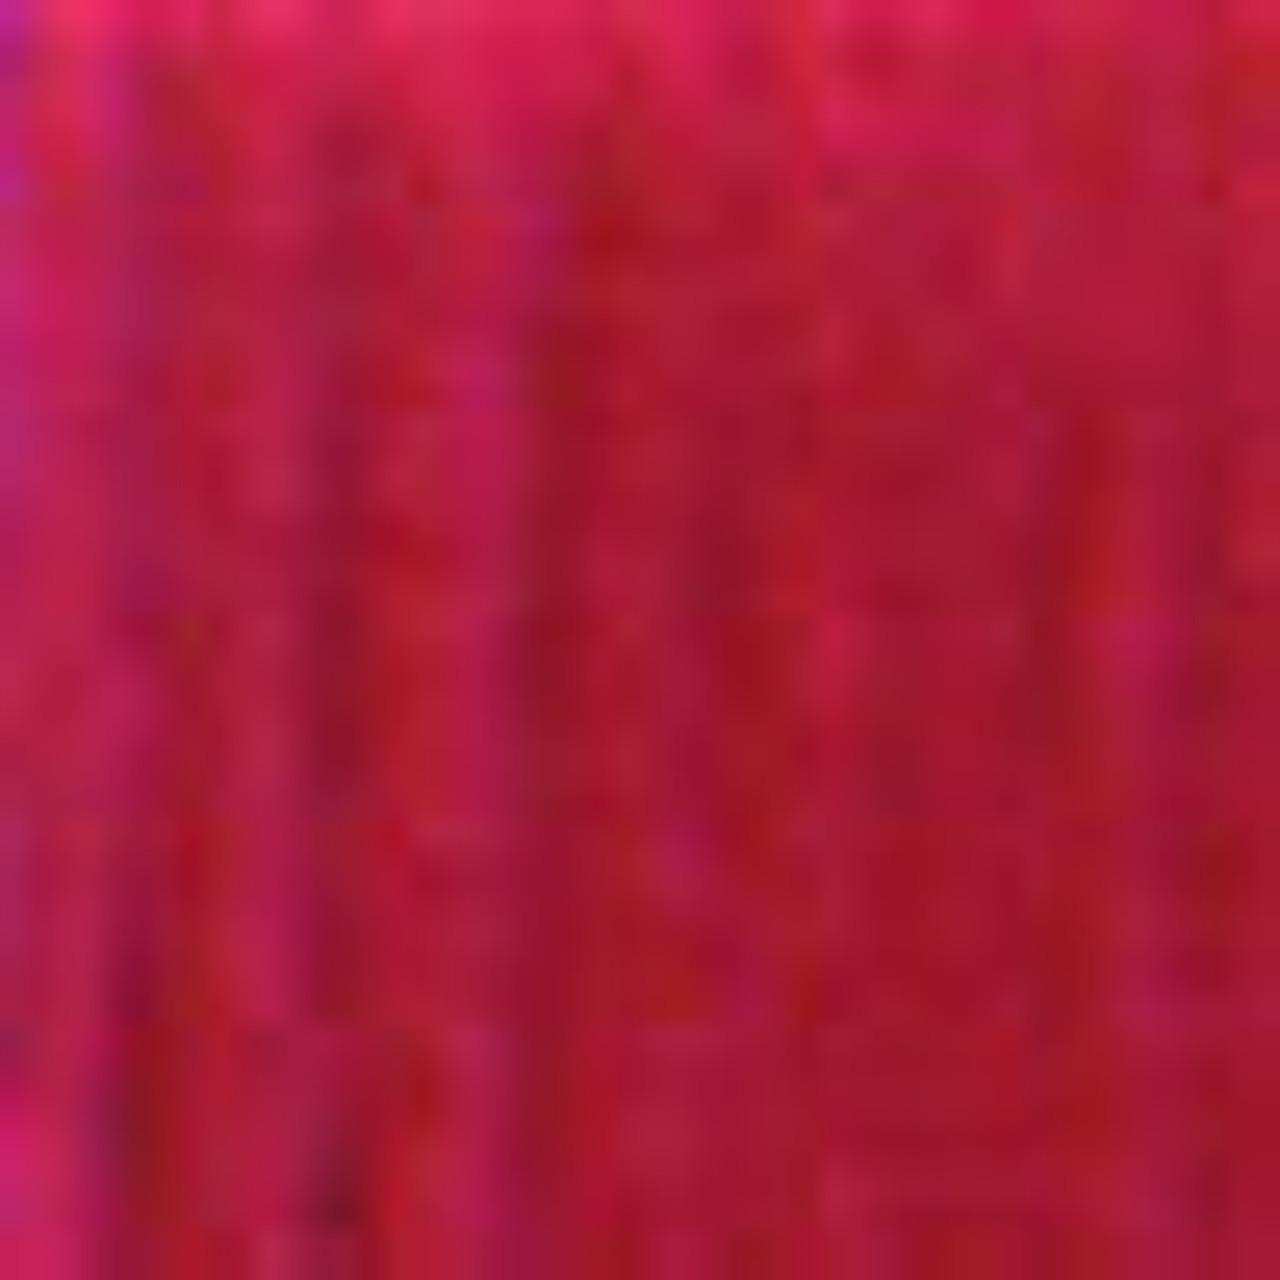 DMC # 915 Dark Plum Floss / Thread